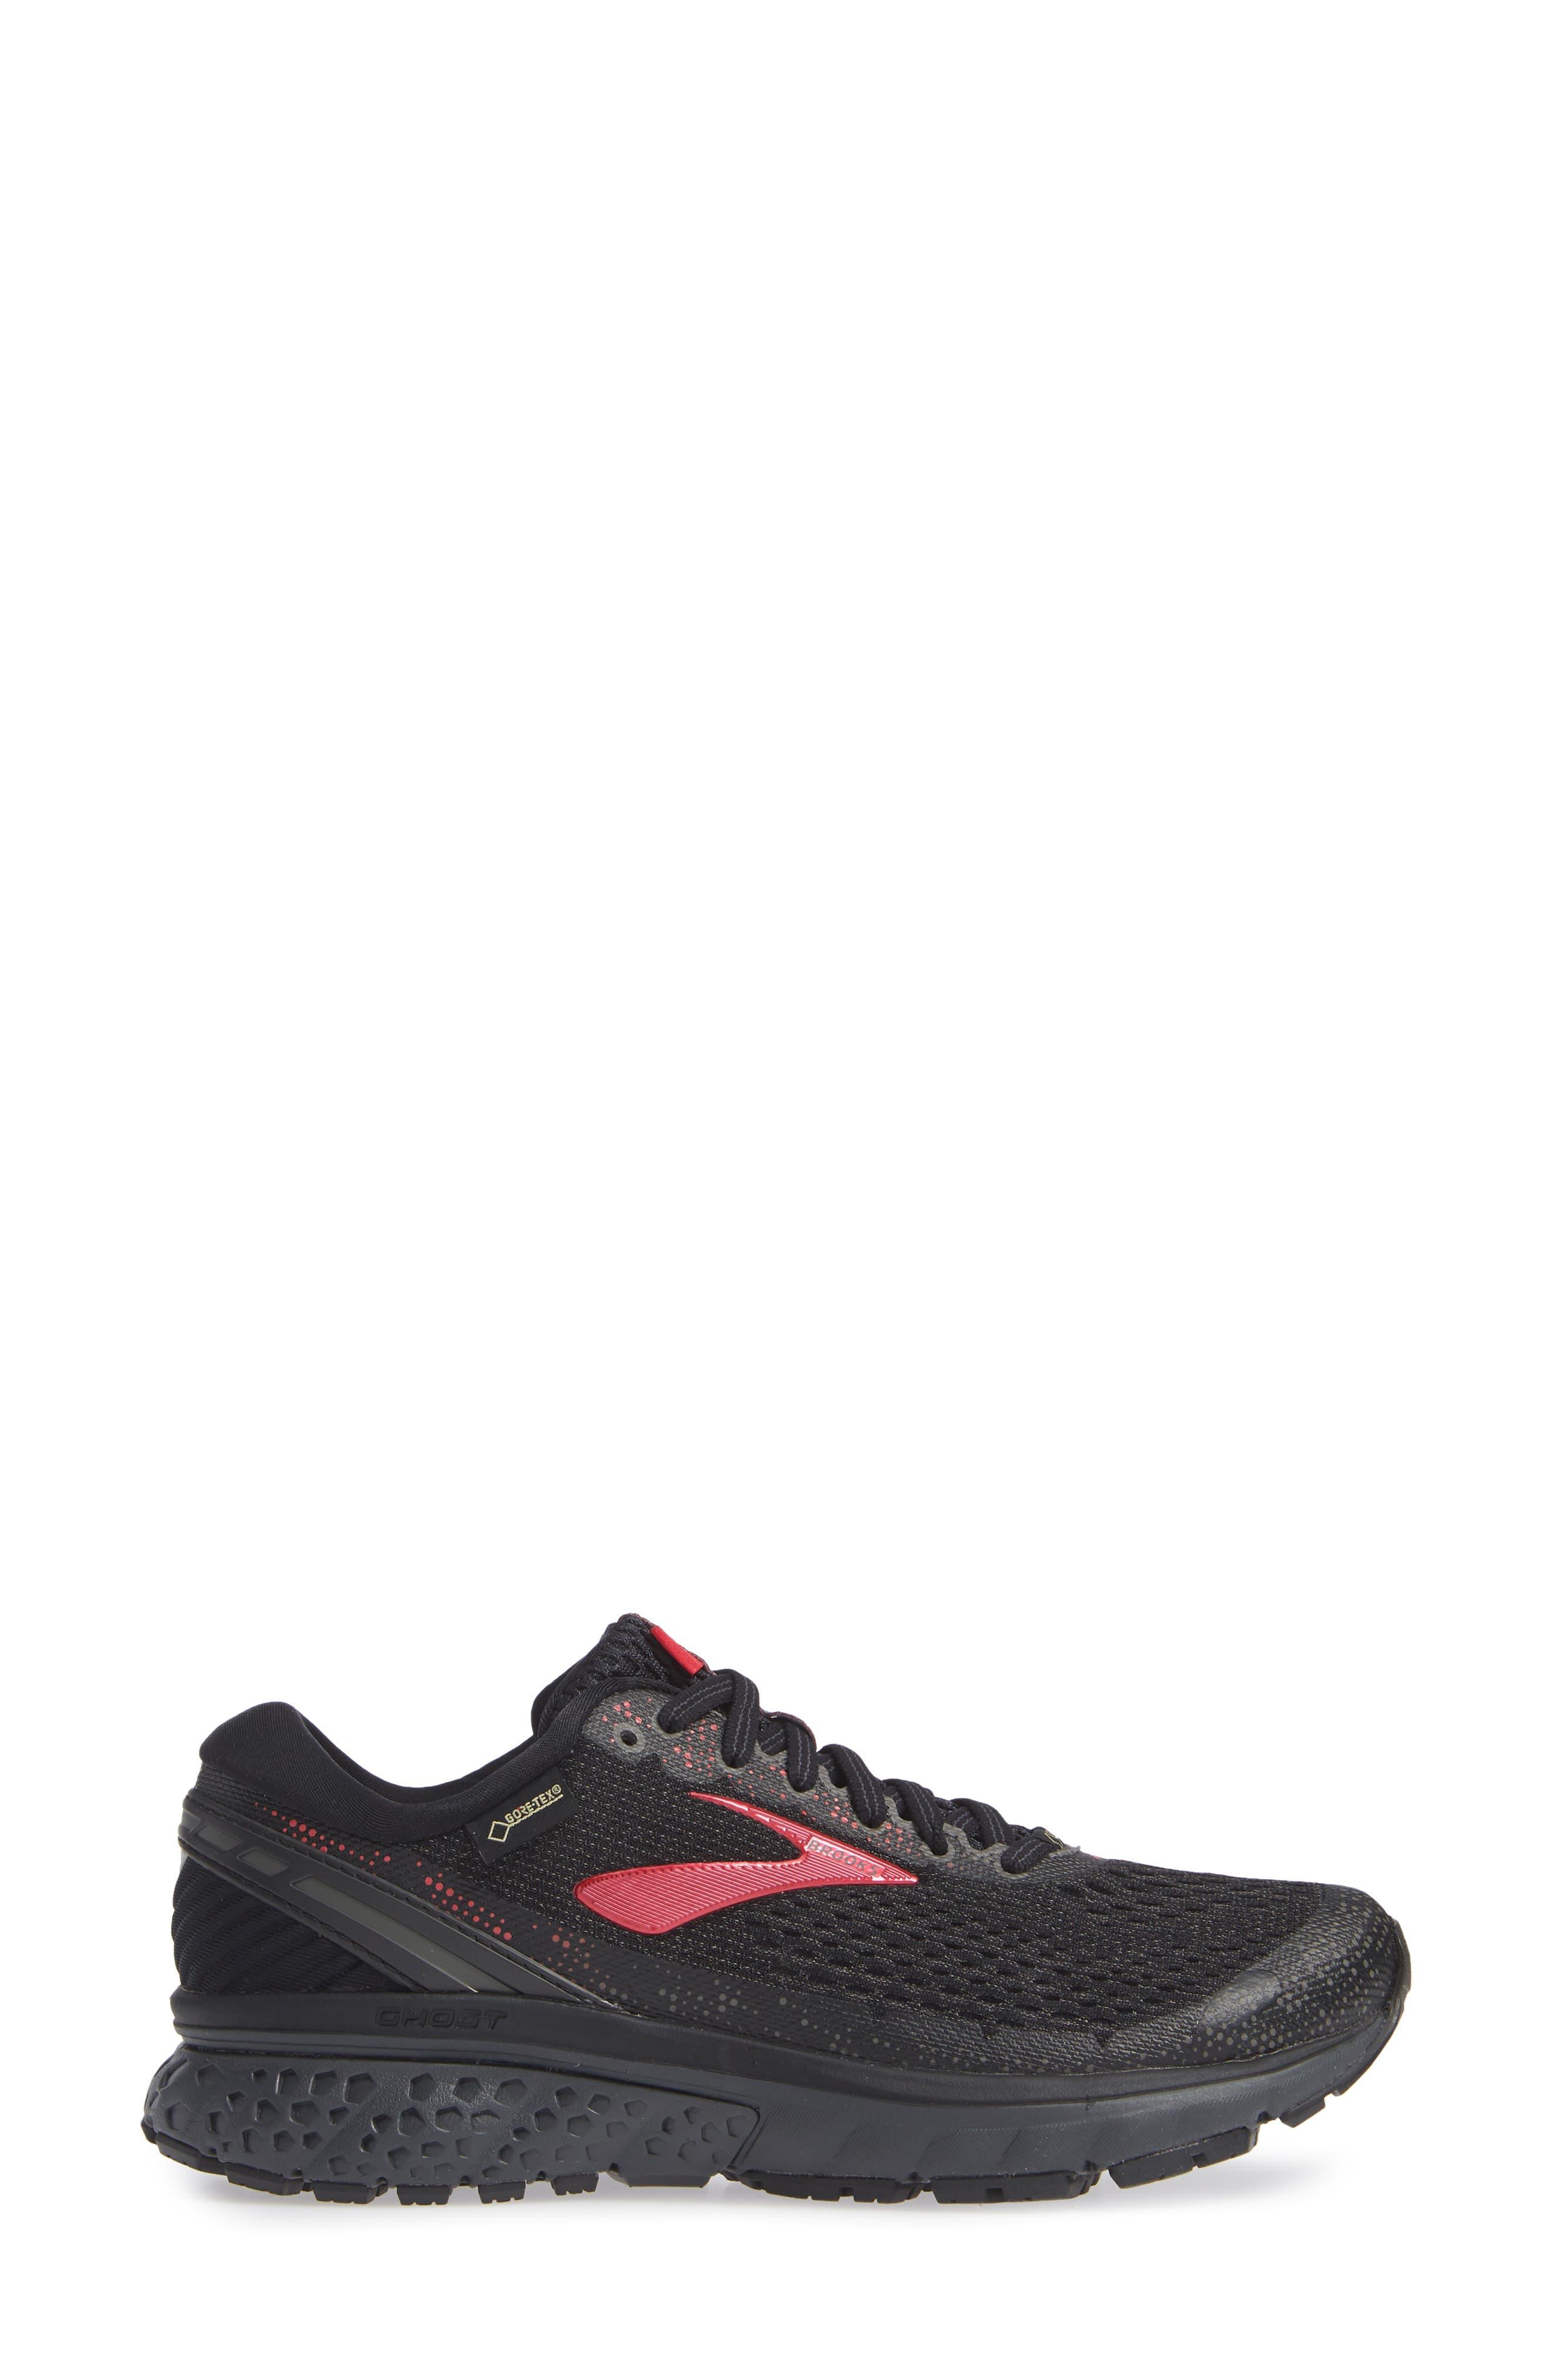 Ghost 11 Running Shoe,                             Alternate thumbnail 3, color,                             BLACK/ PINK/ EBONY